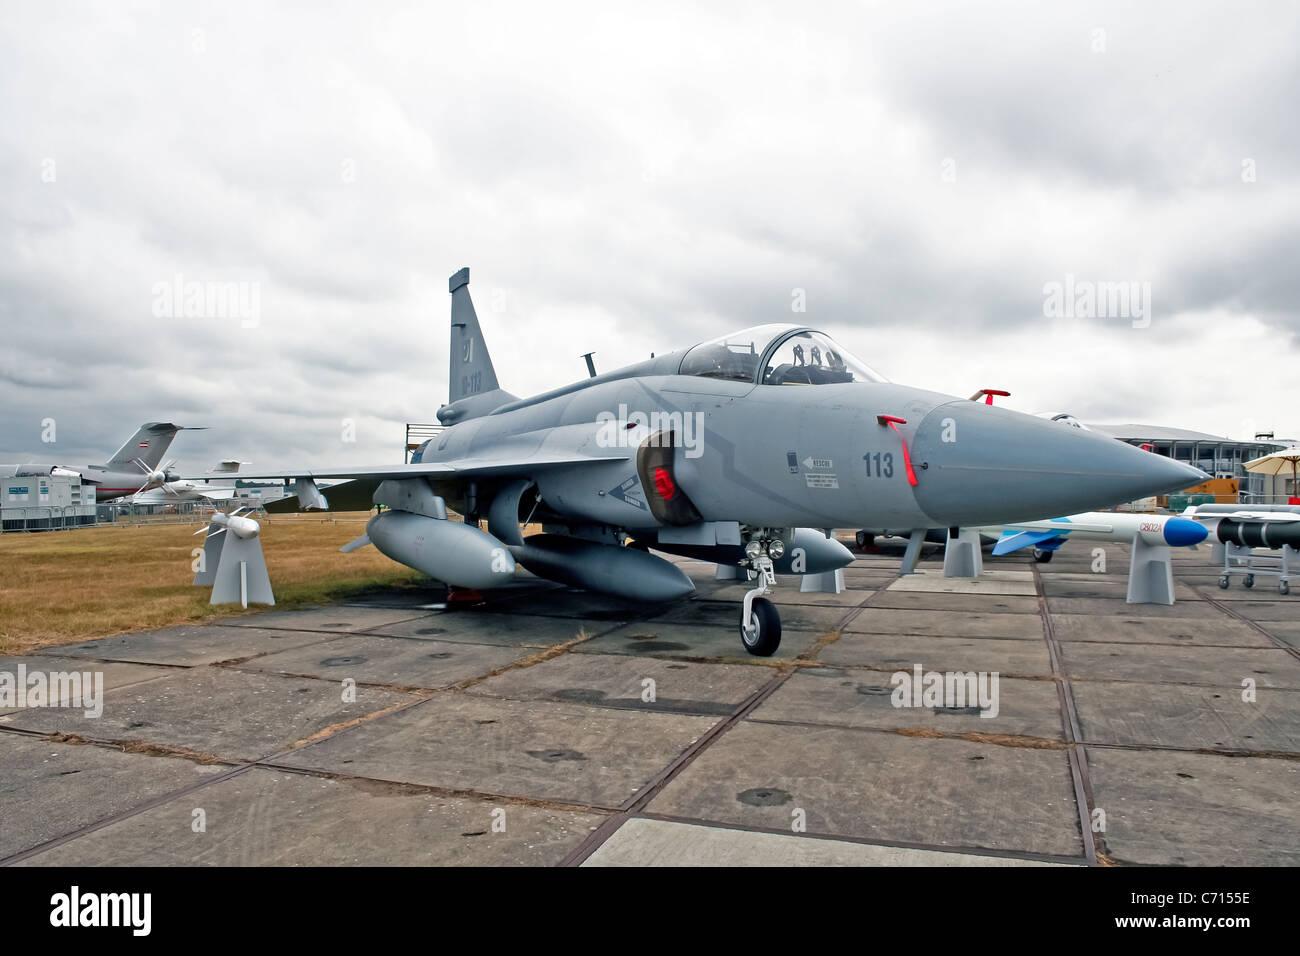 Pakistan Aeronautical Complex JF-17 Thunder 10-113 at the Farnborough International Airshow - Stock Image